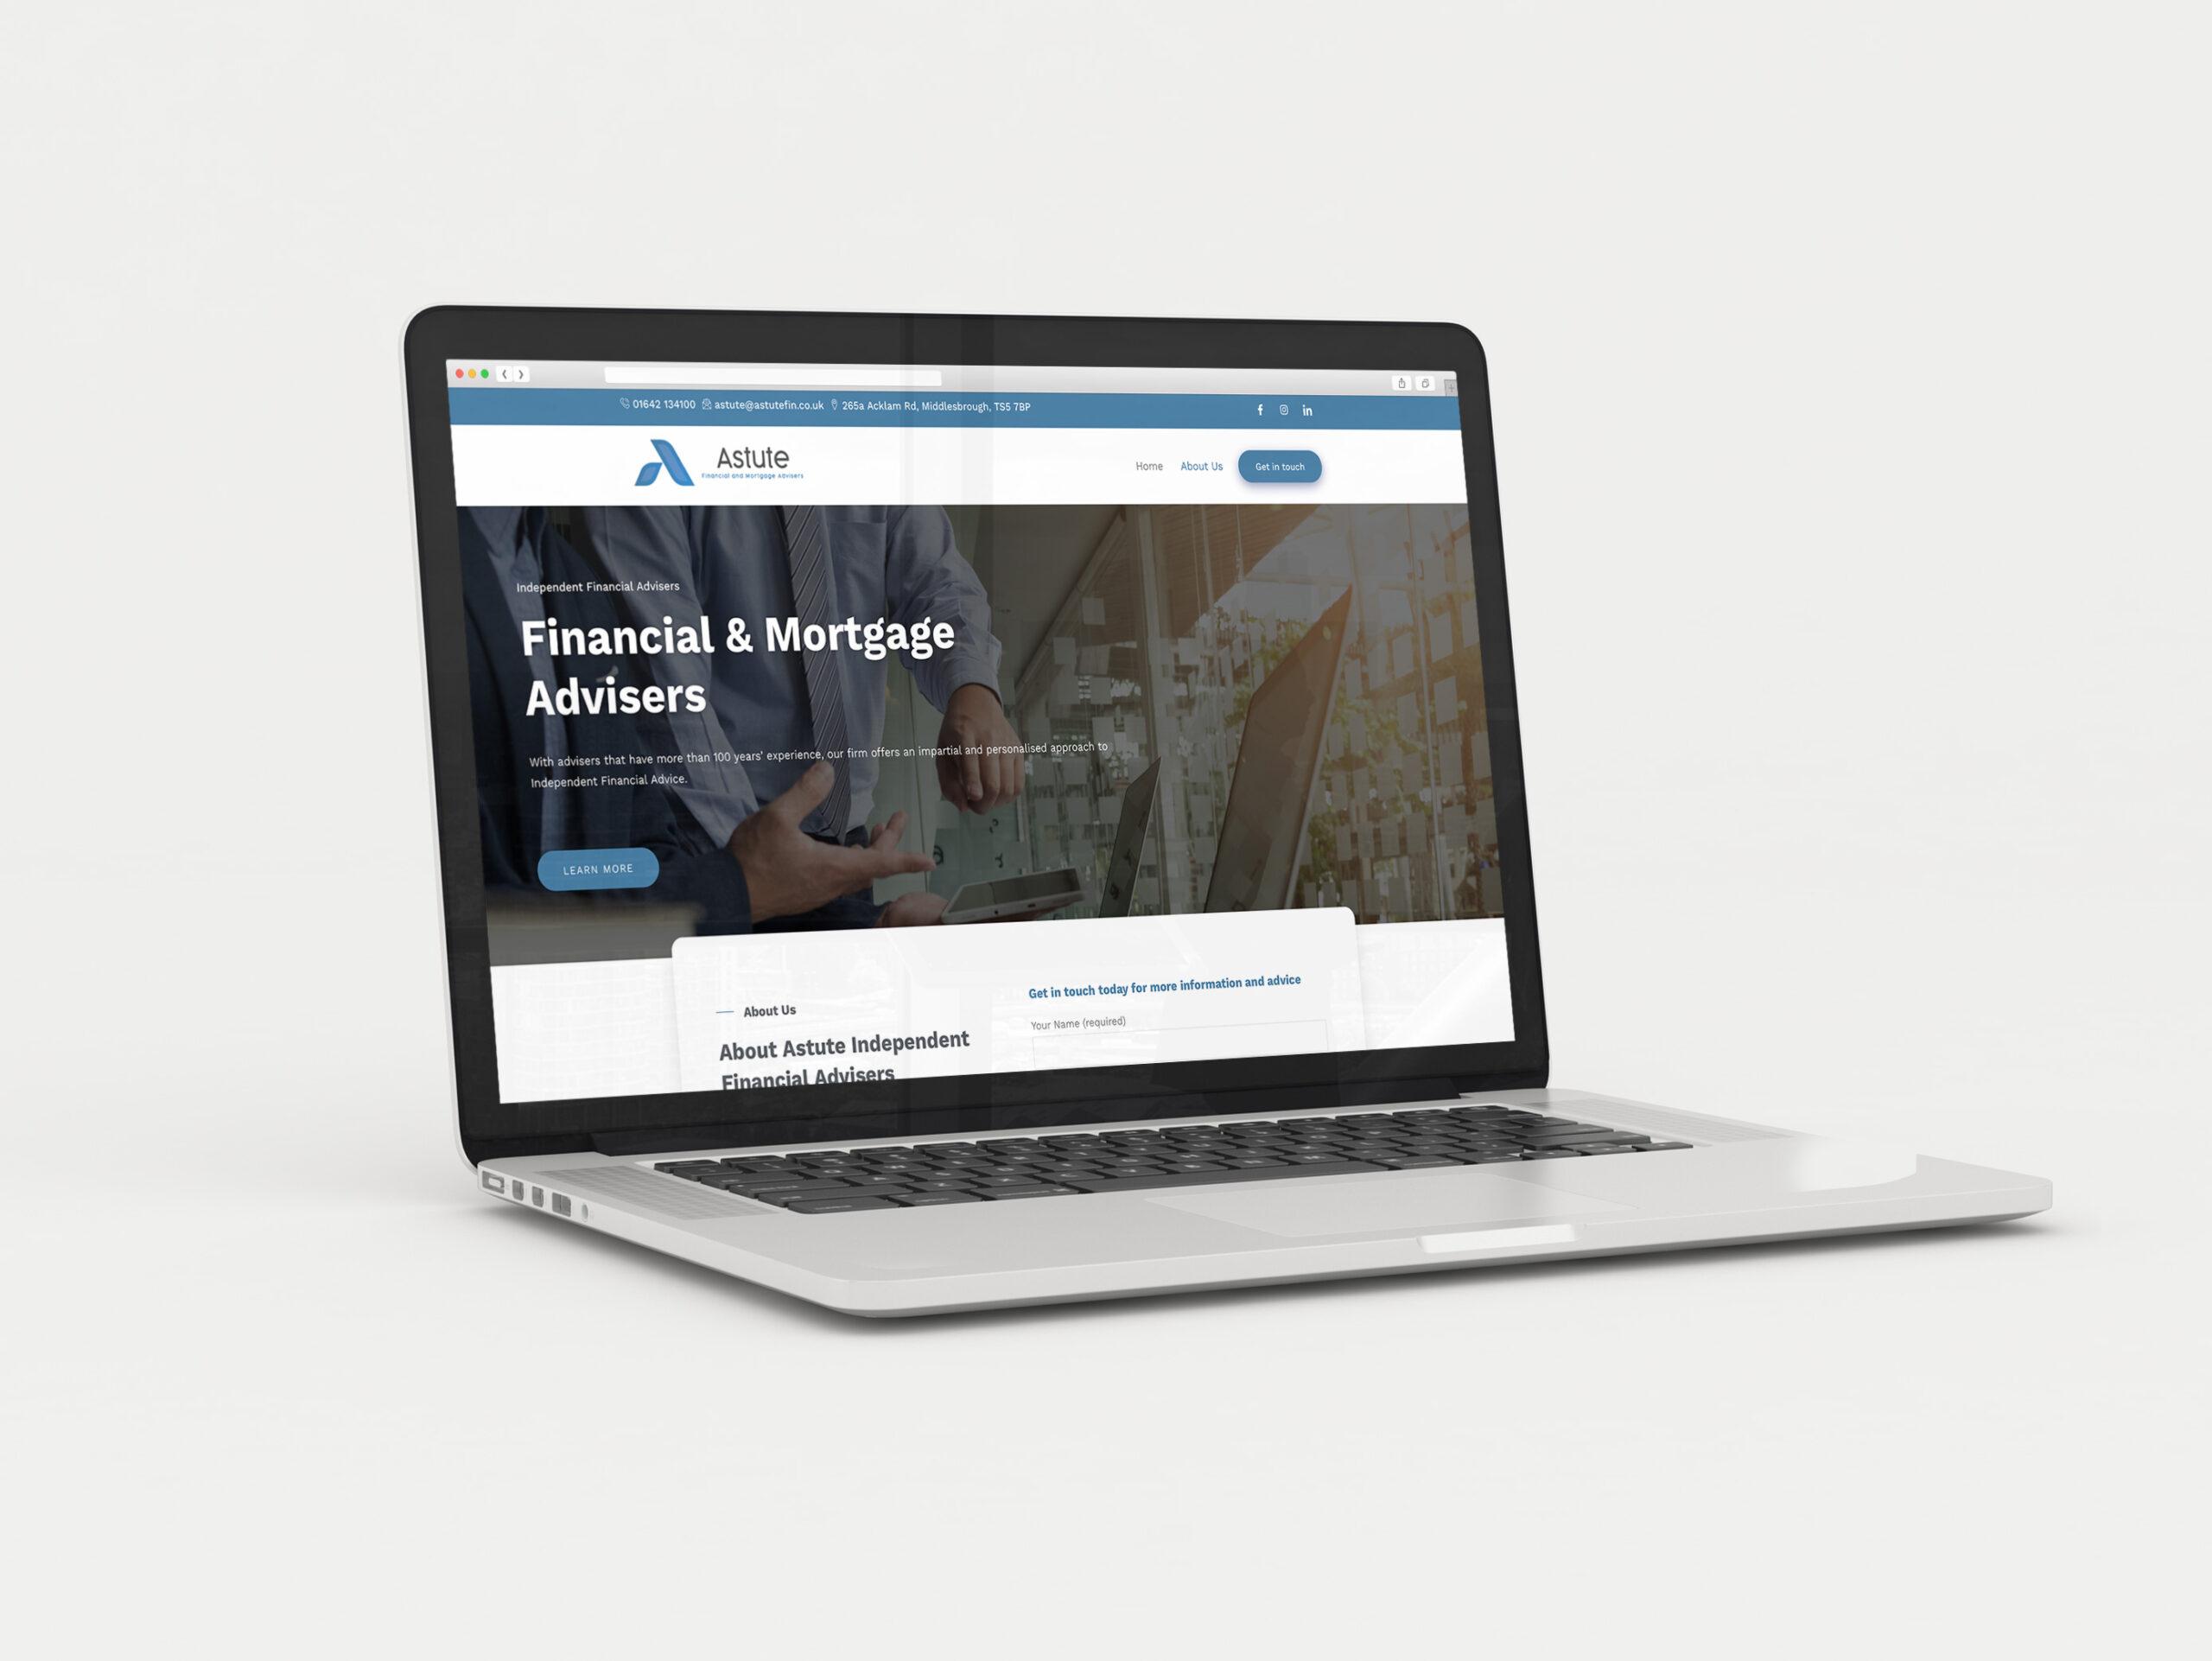 Astute Finance & Mortgage website development by Very Vivid, marketing support Blackburn Lancashire